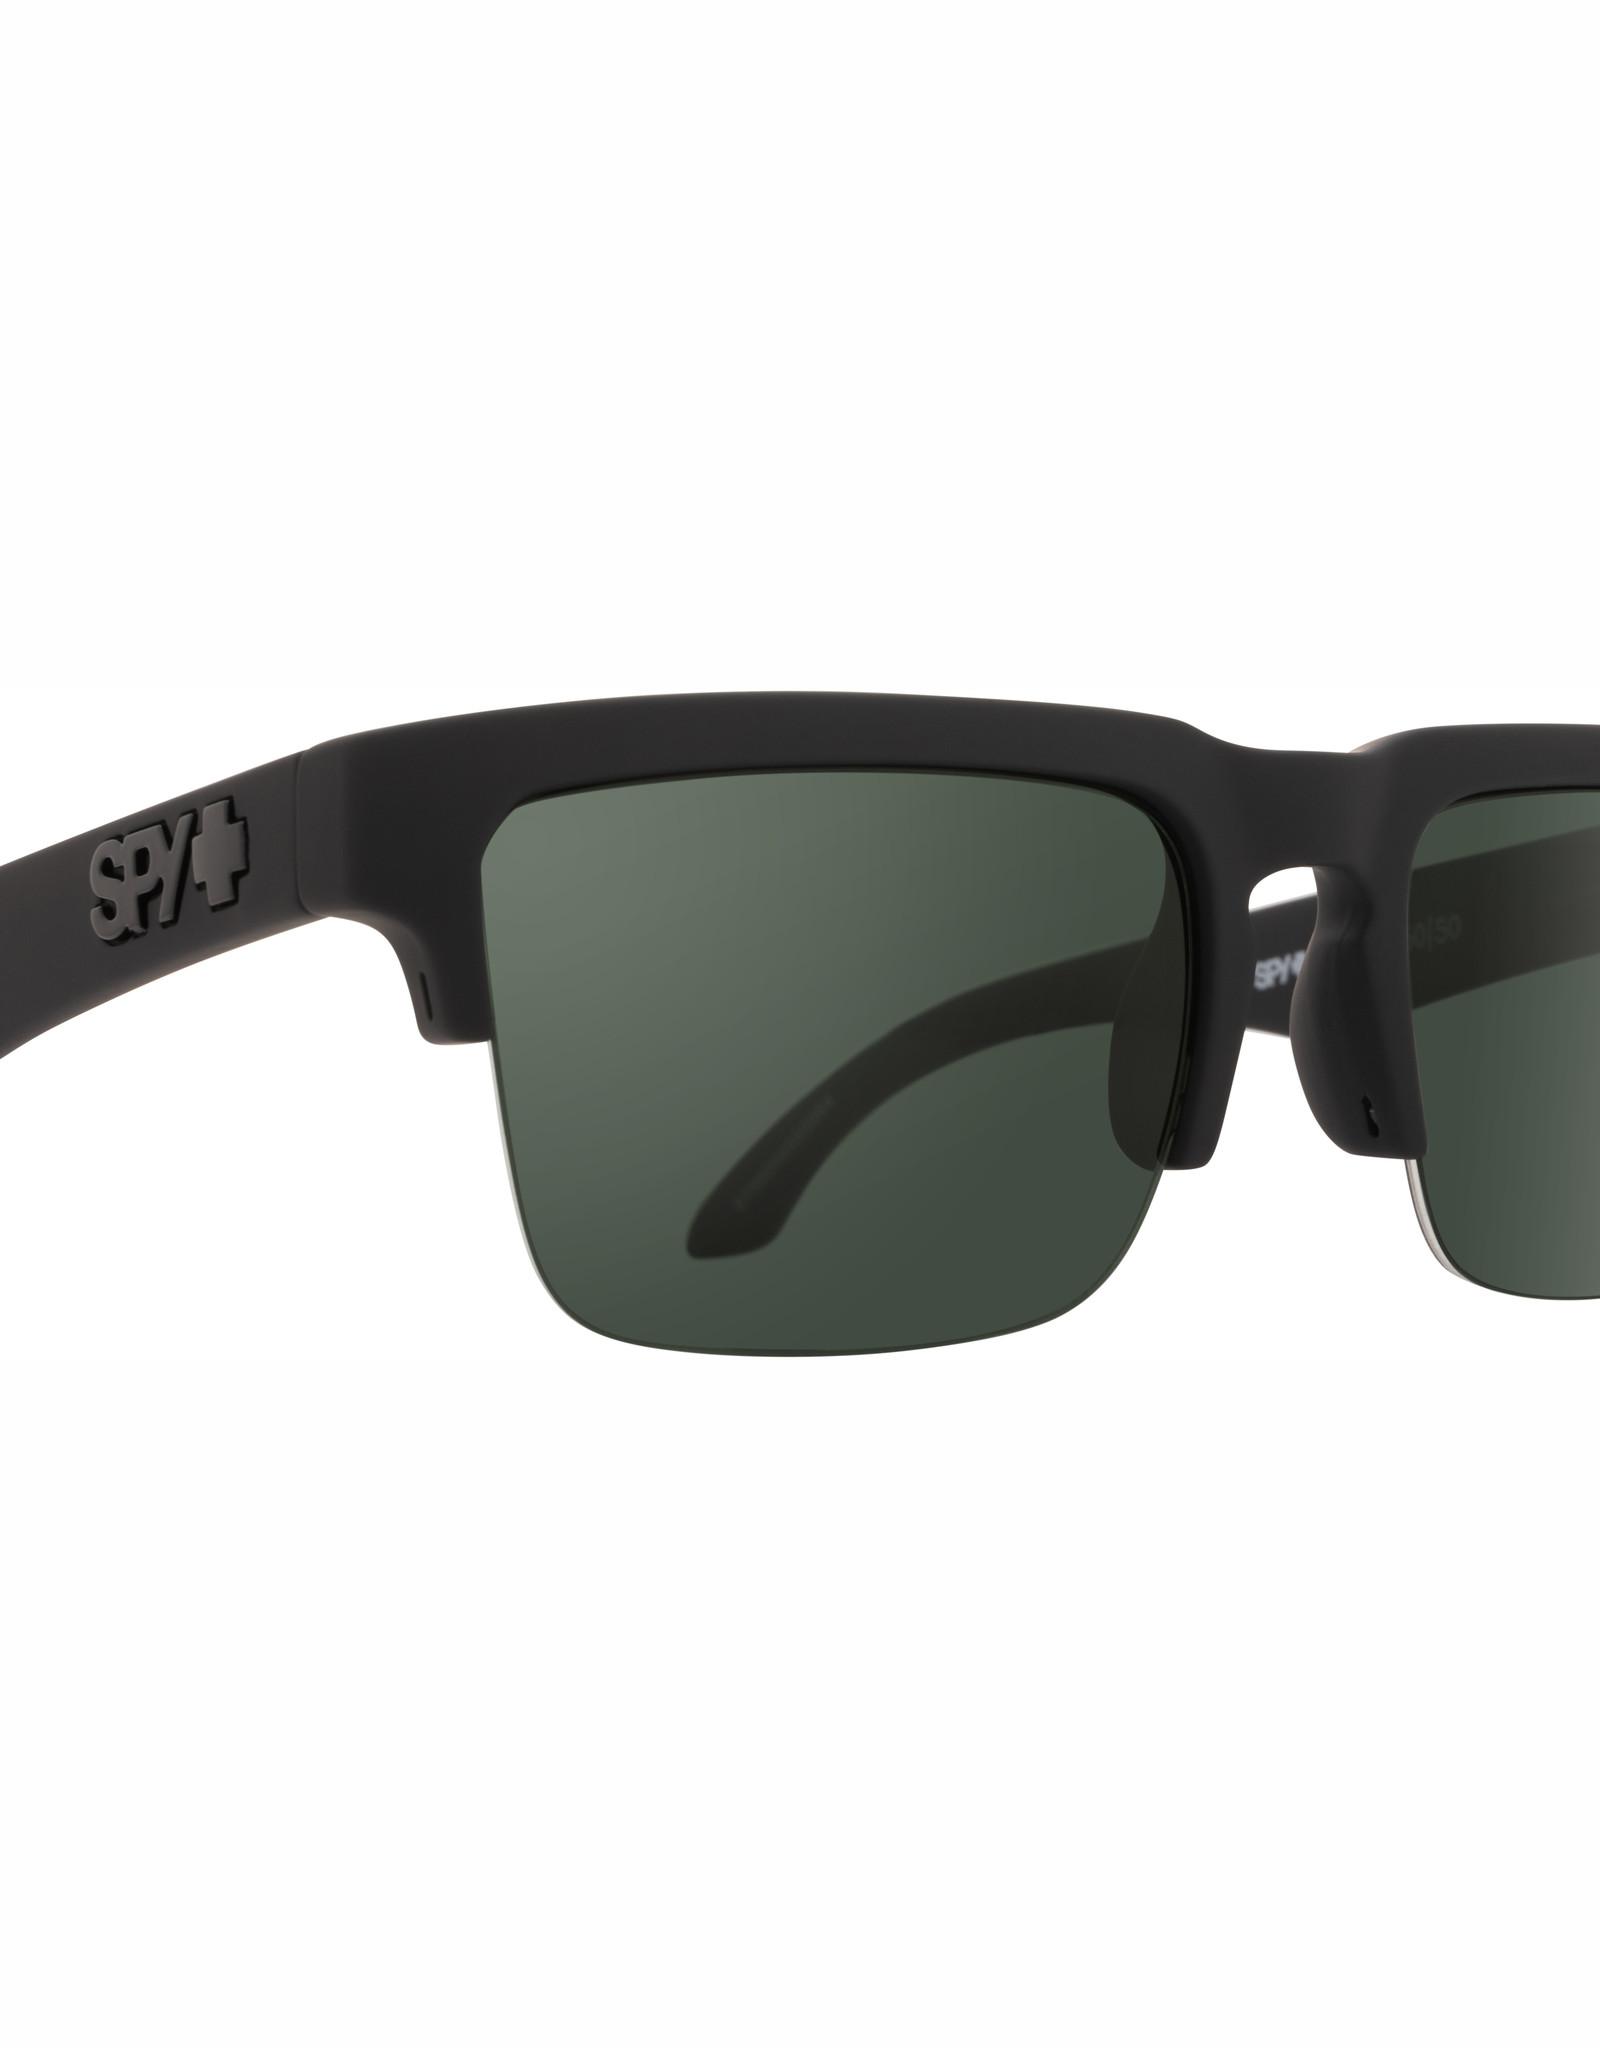 Spy Helm 5050 Soft Matte Black HD Plus Gray Green Polar